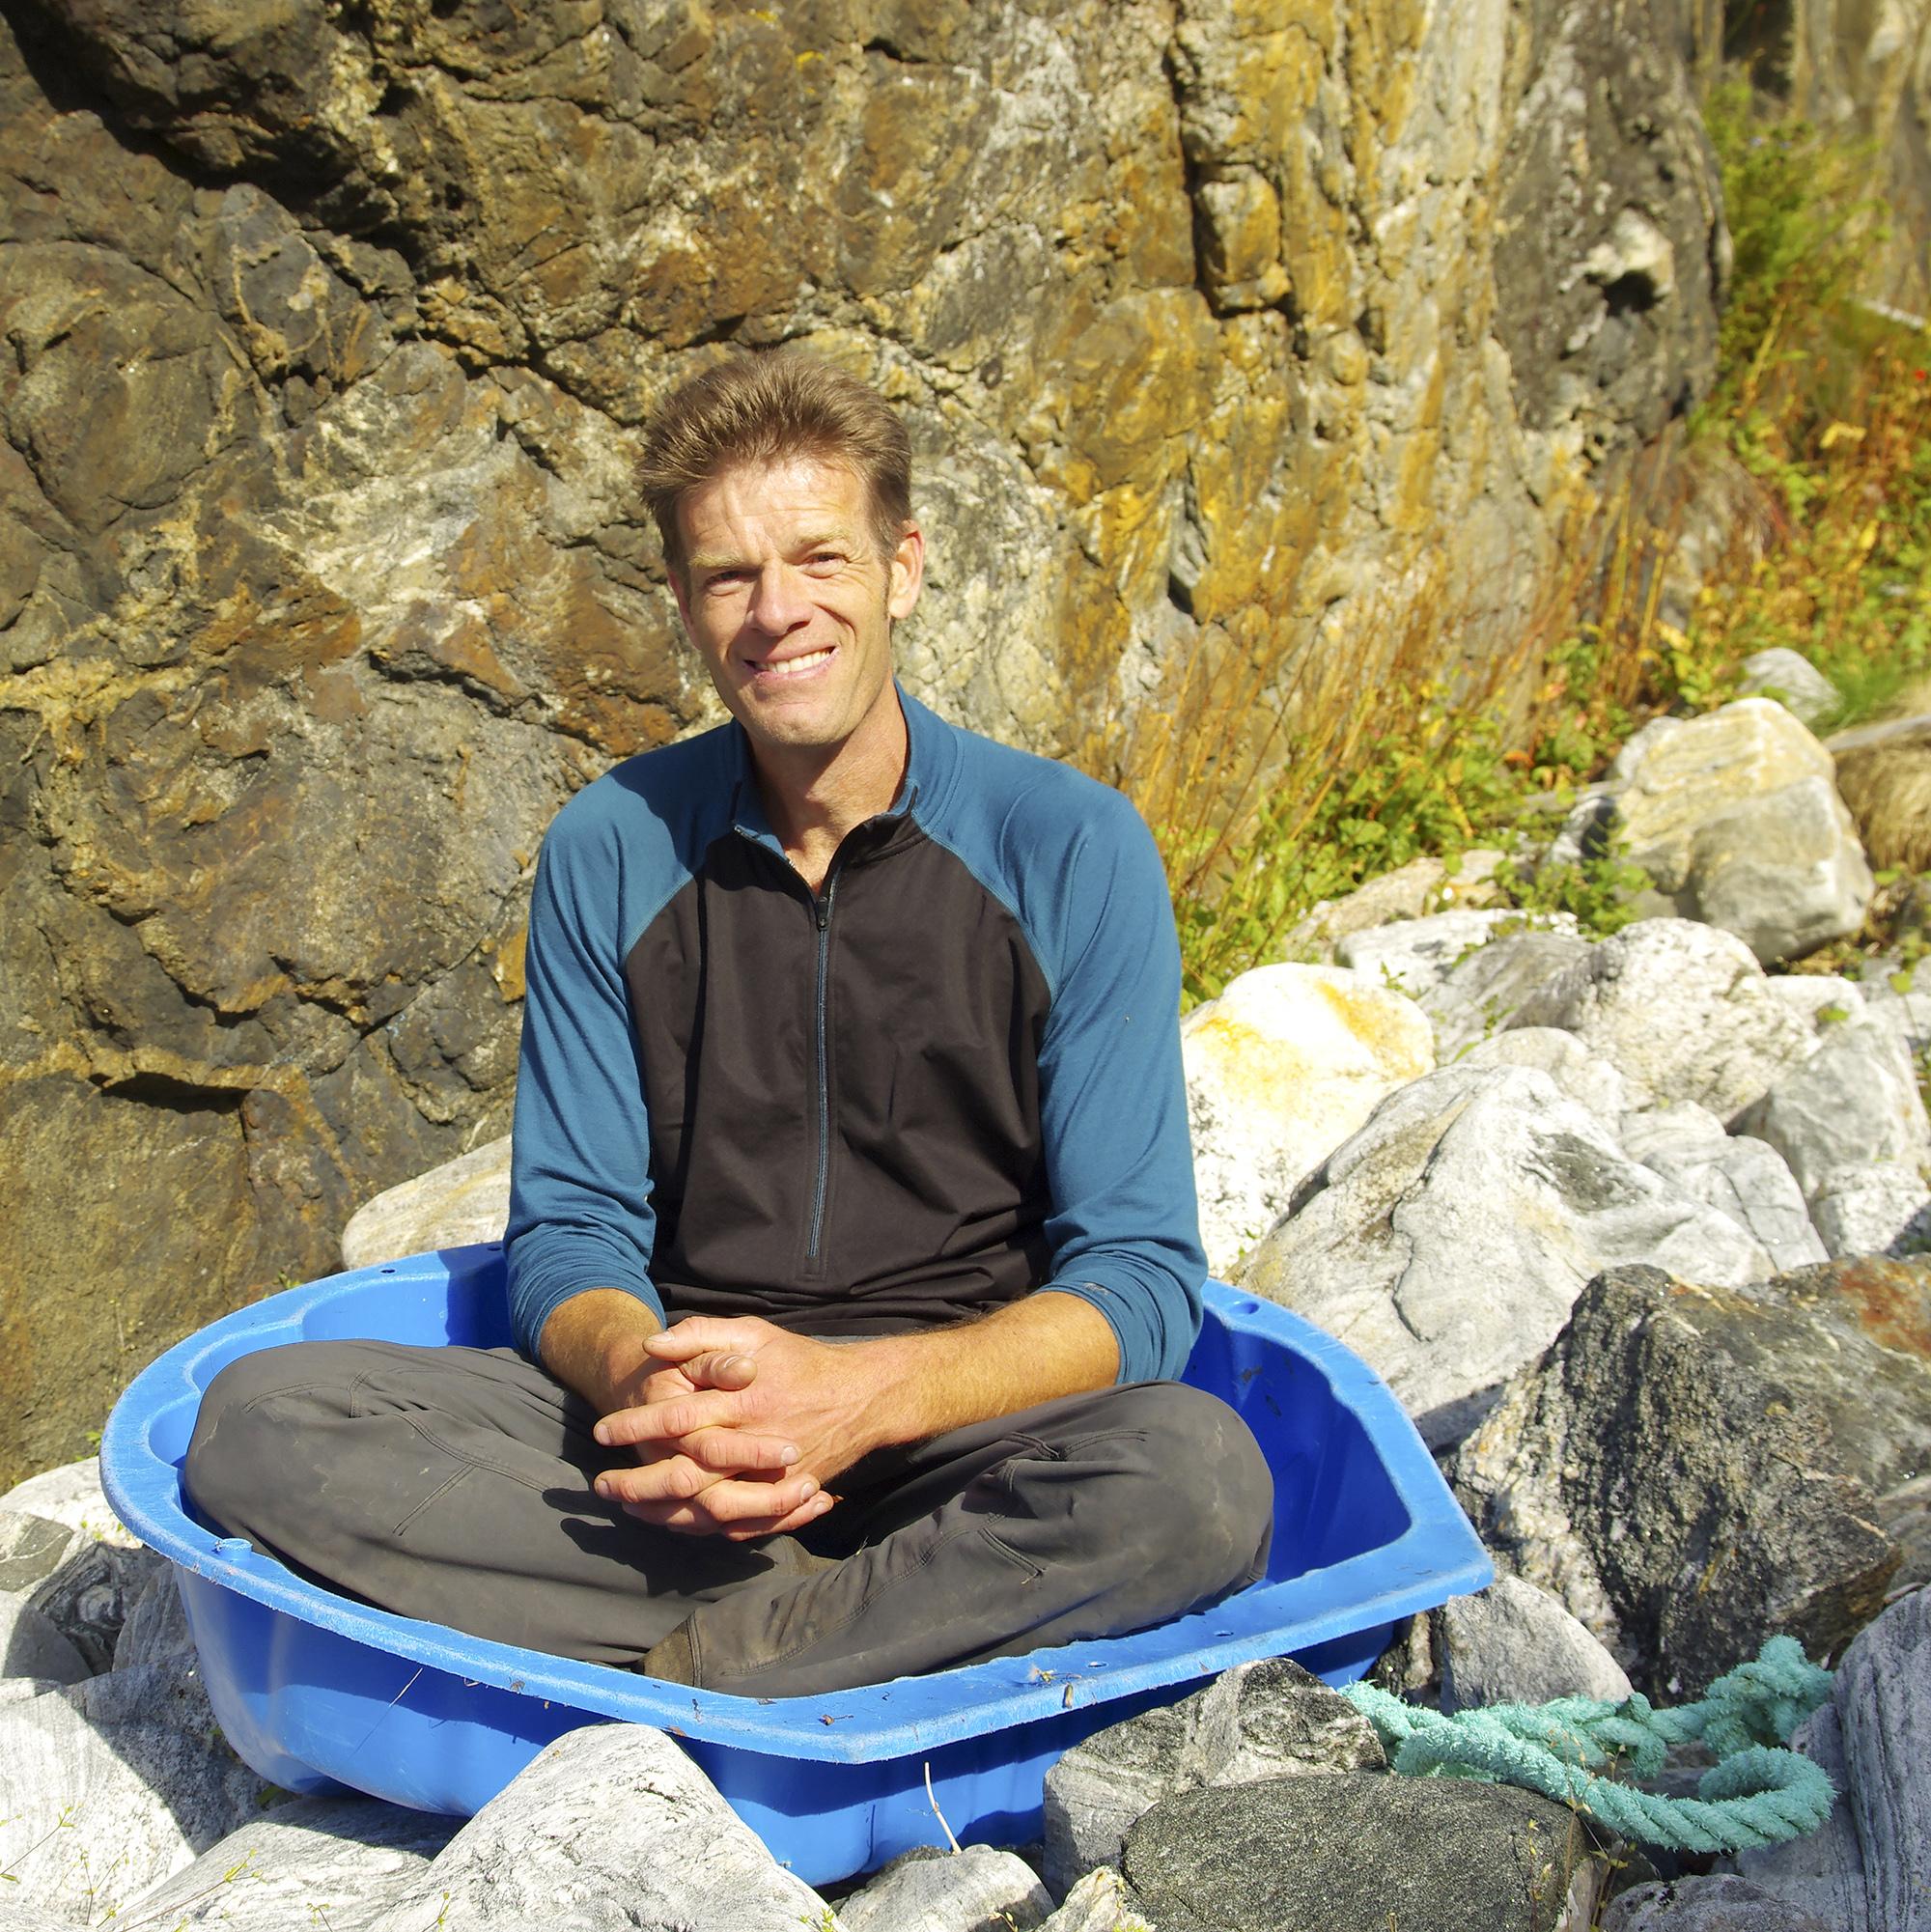 Artikkelforfatteren i nærkontakt med strandsøppel.